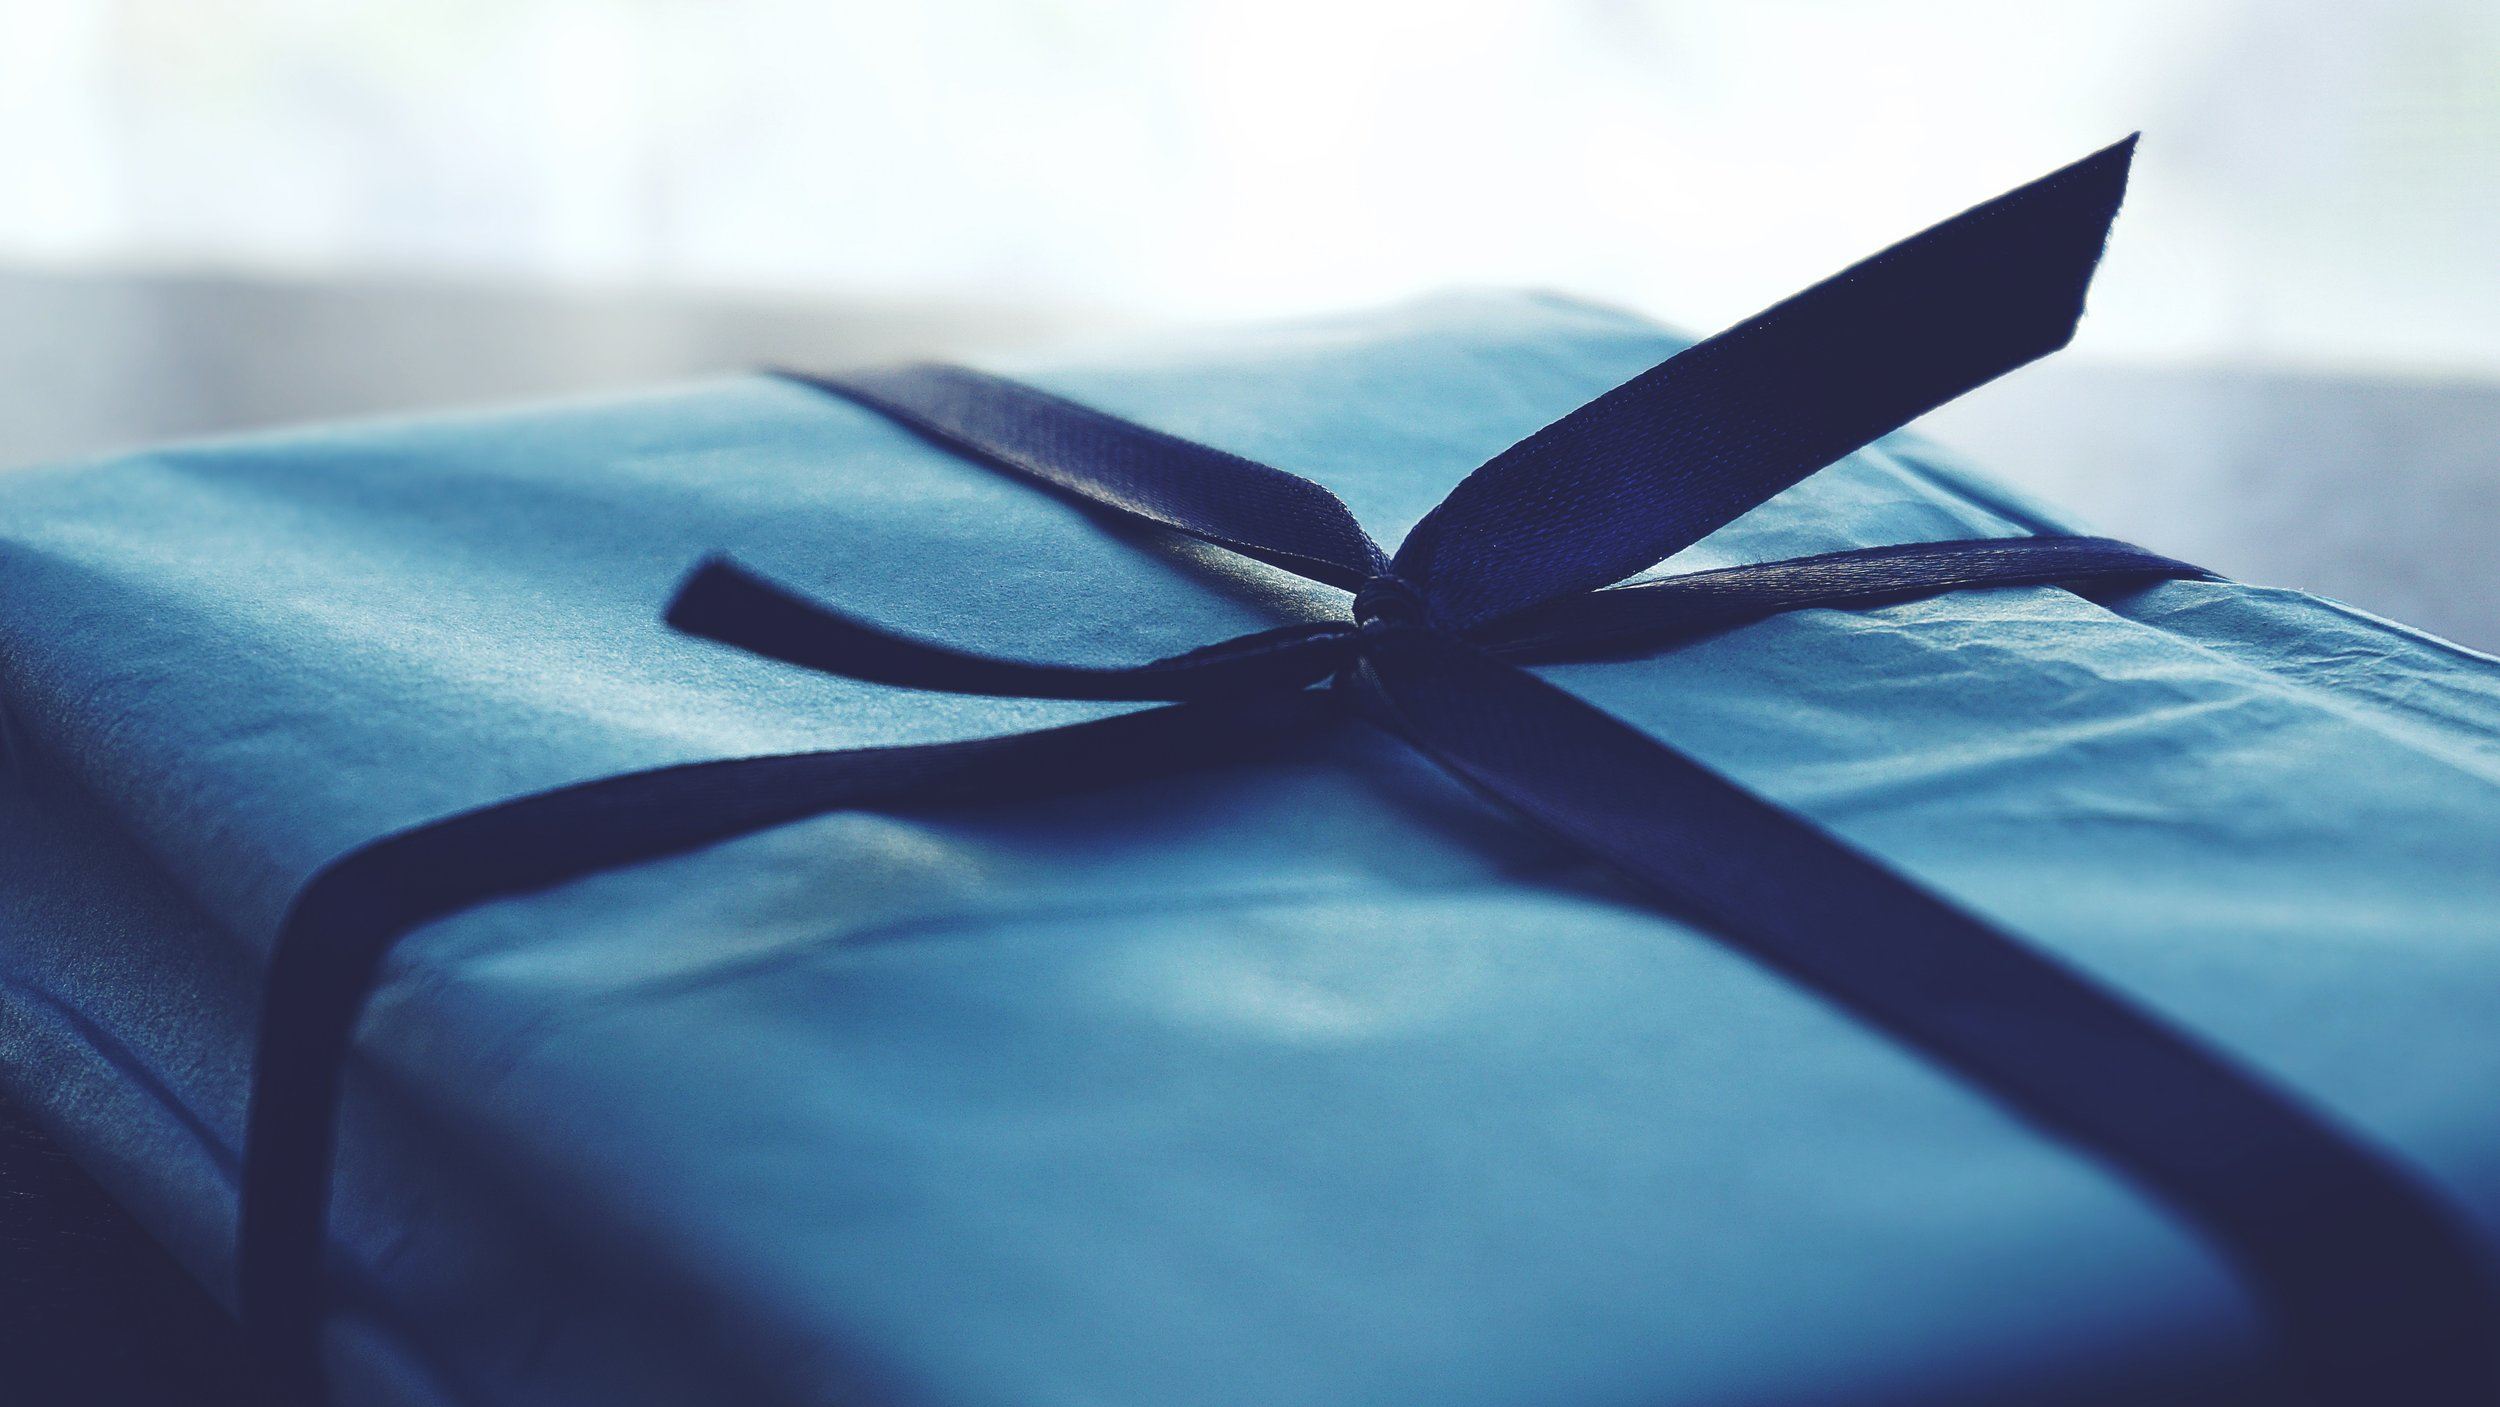 art-birthday-gift-blue-1178562.jpg